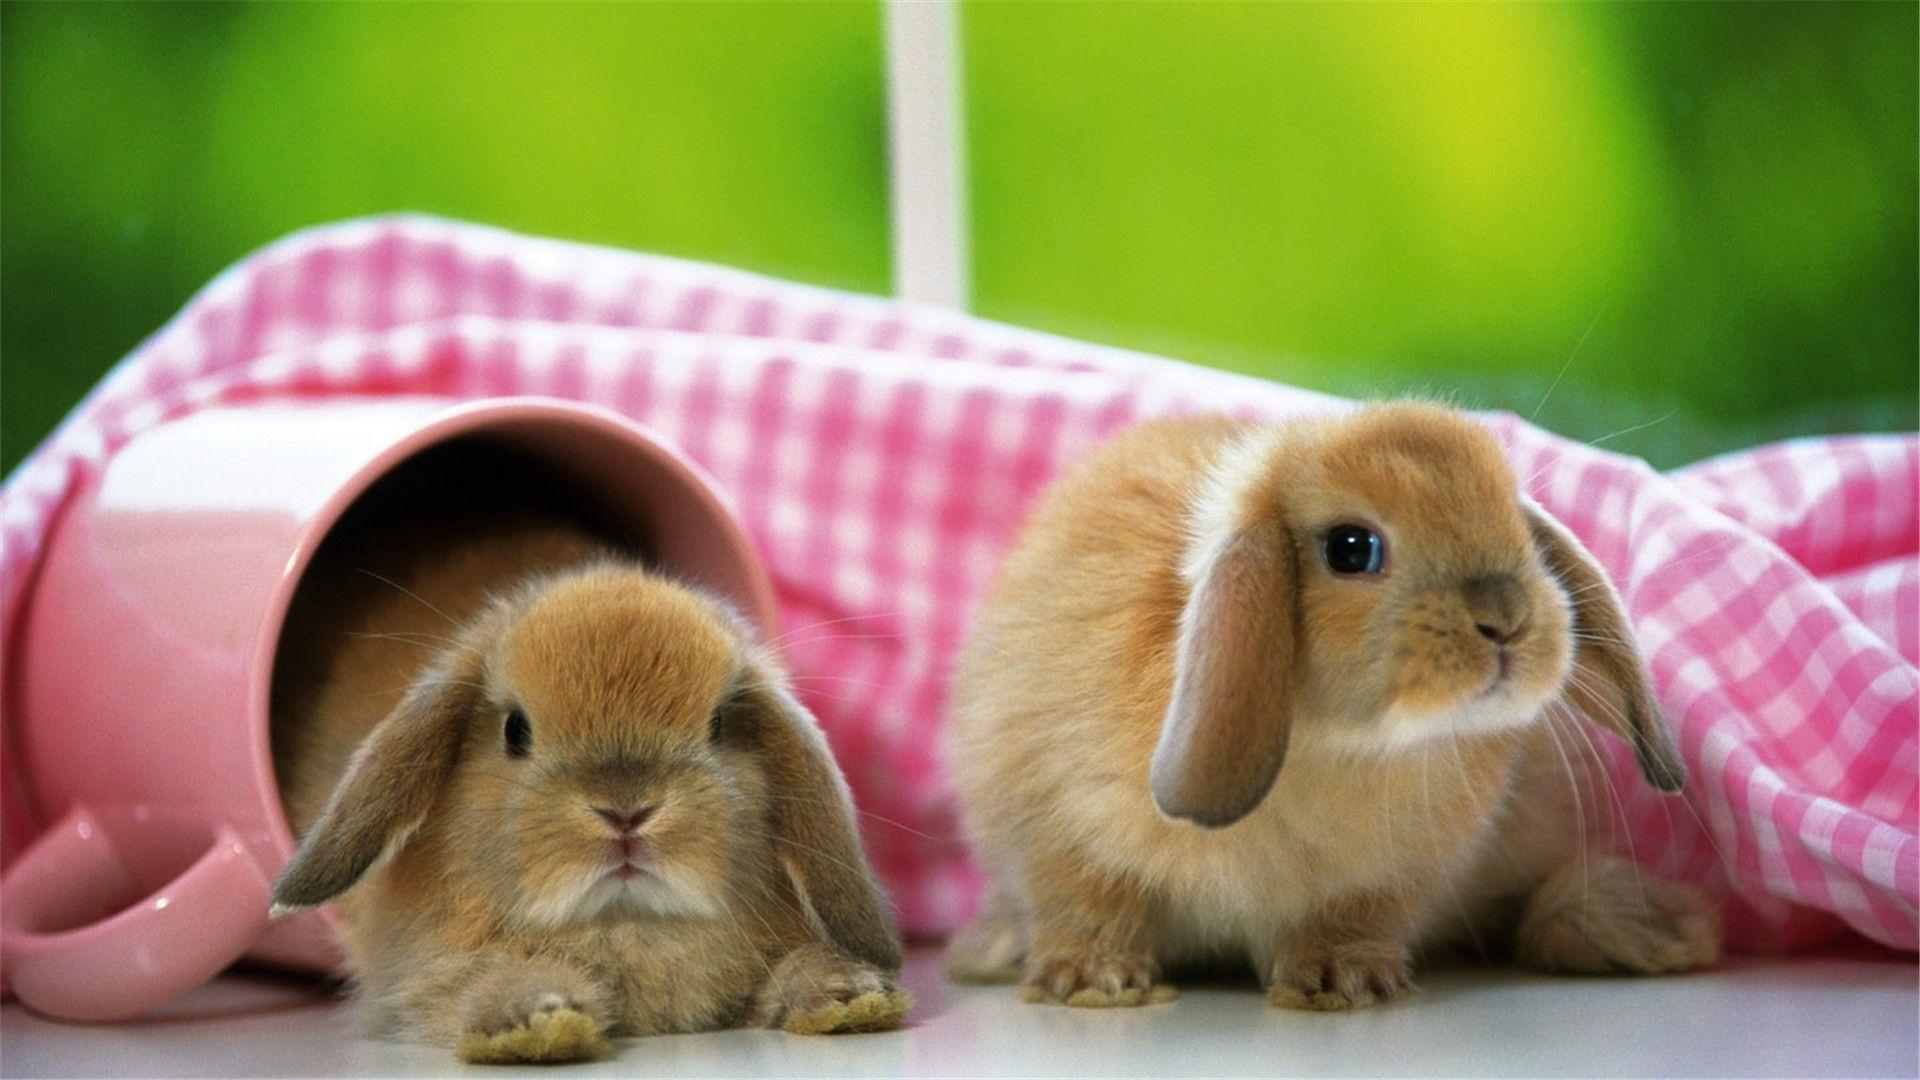 Cute Rabbit wallpaper for computer